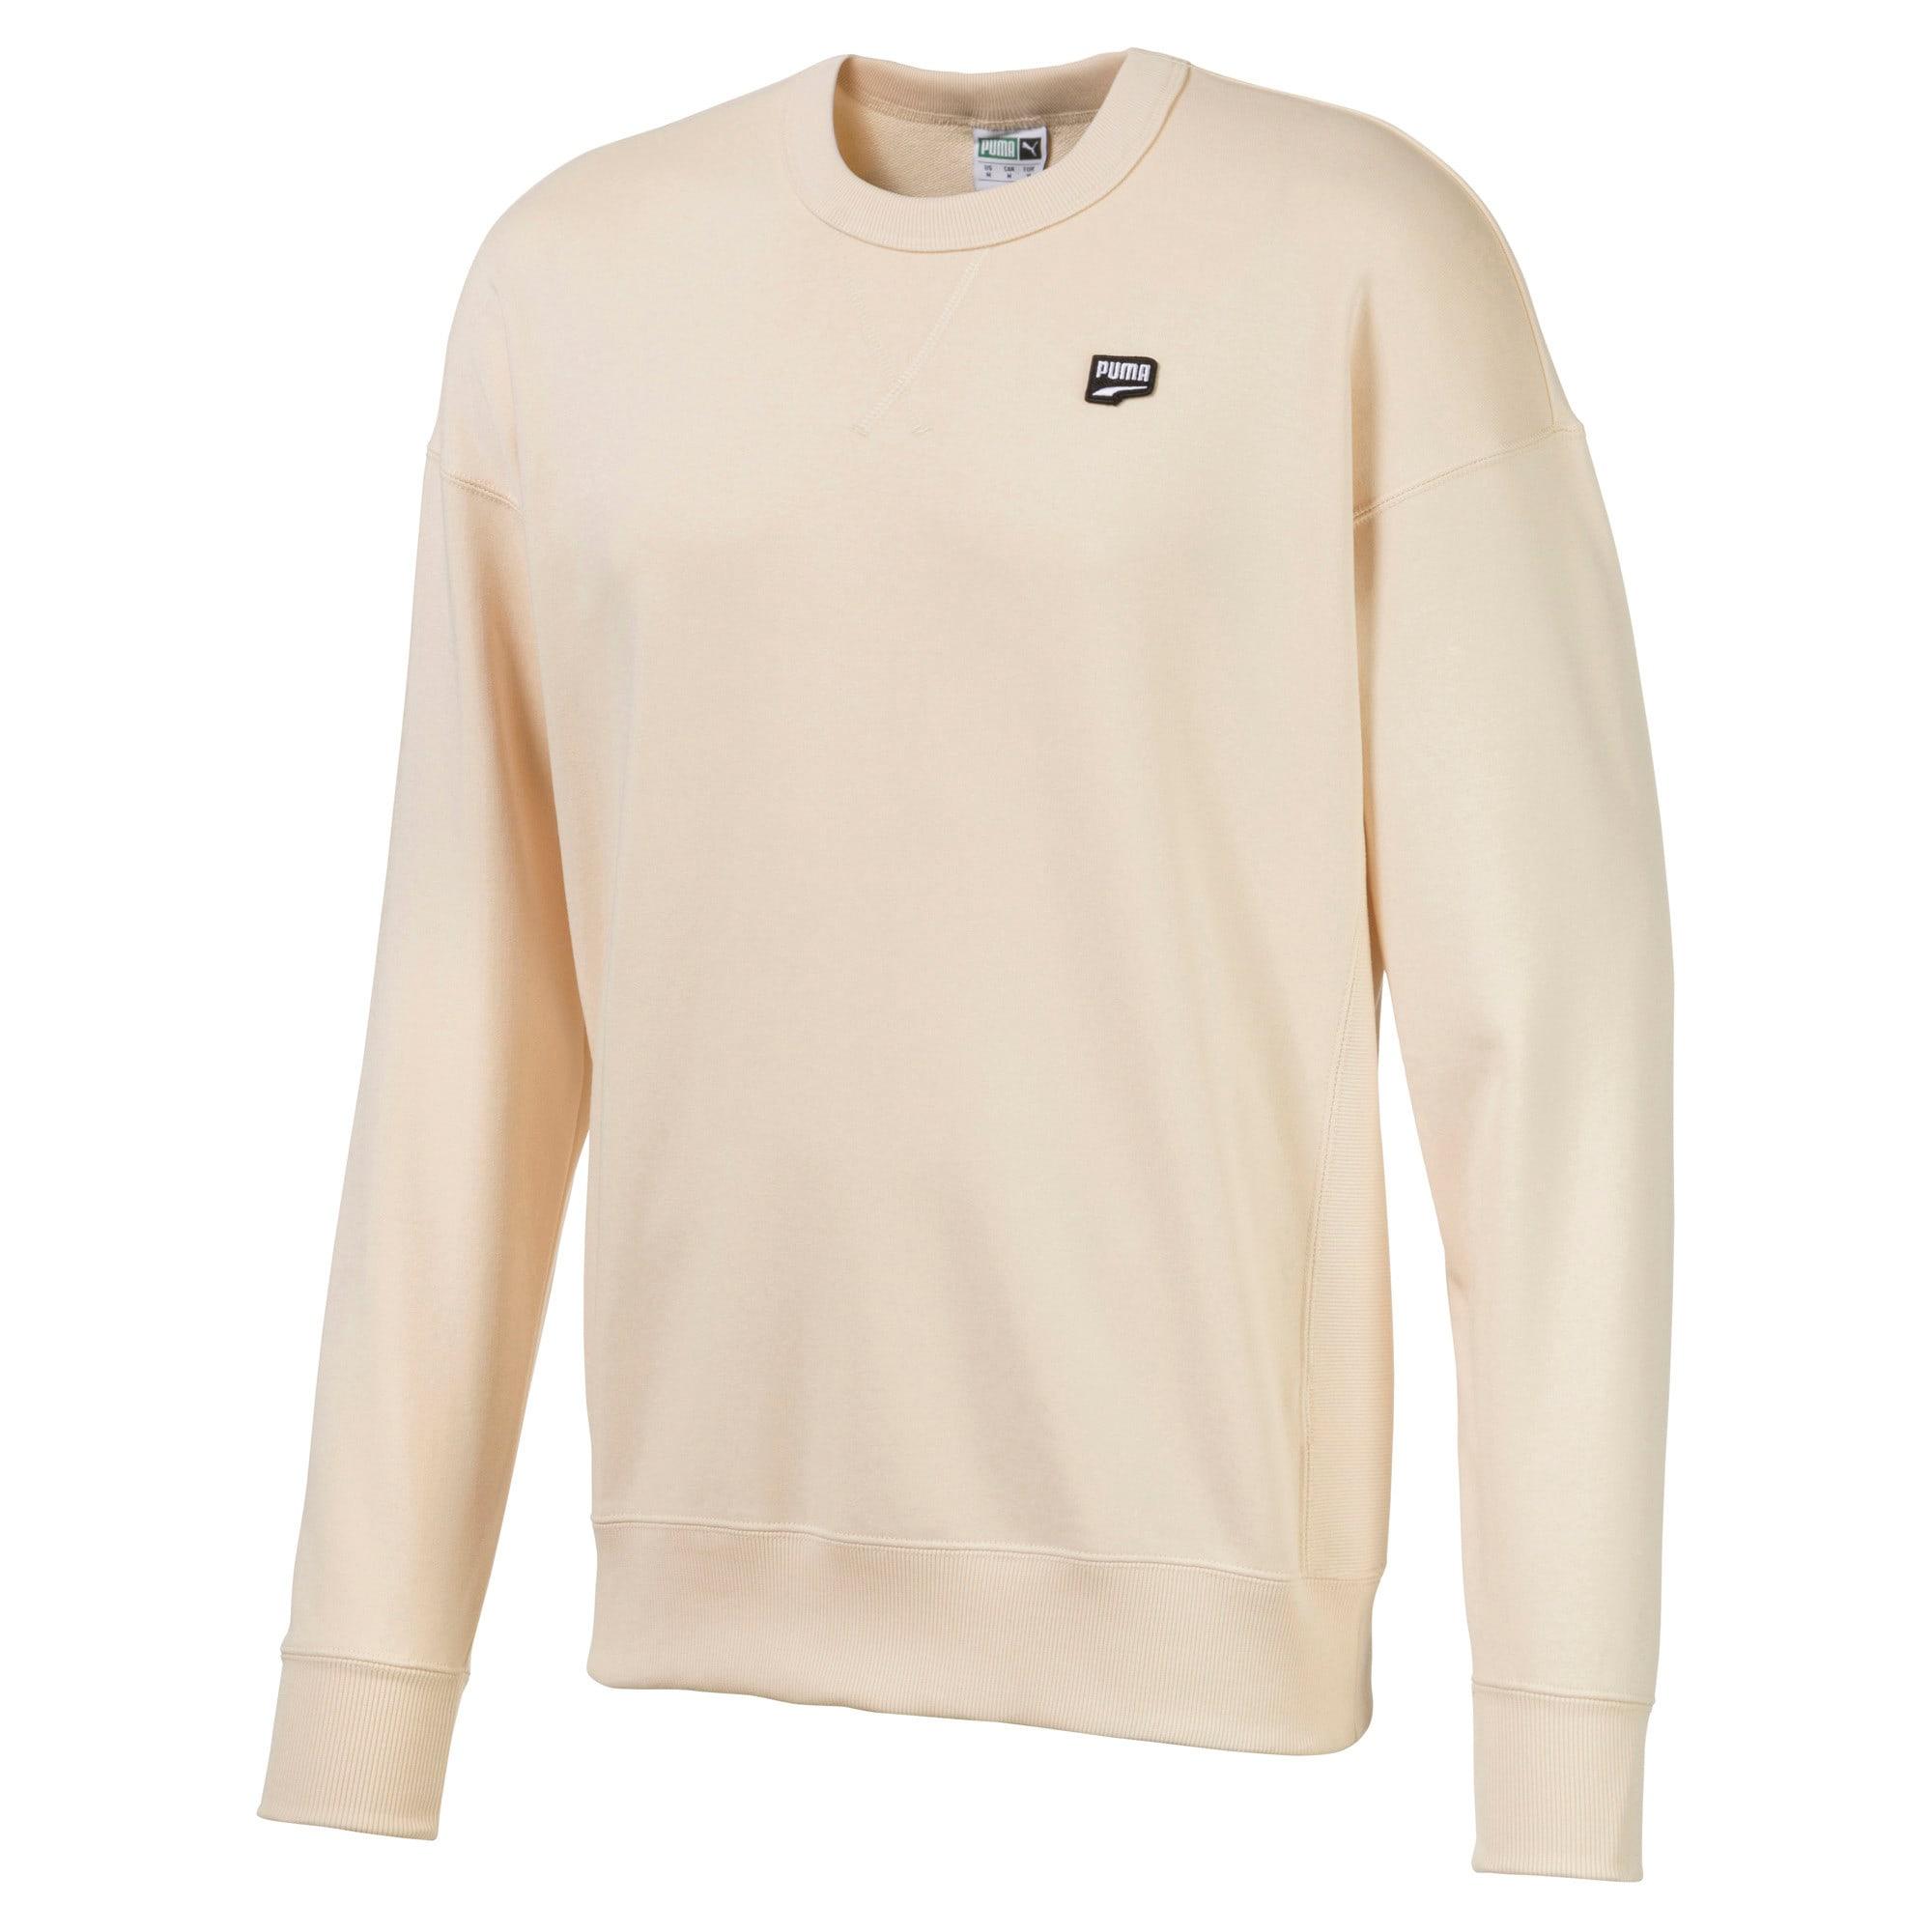 Thumbnail 1 of Downtown Men's Crewneck Sweatshirt, White Smoke, medium